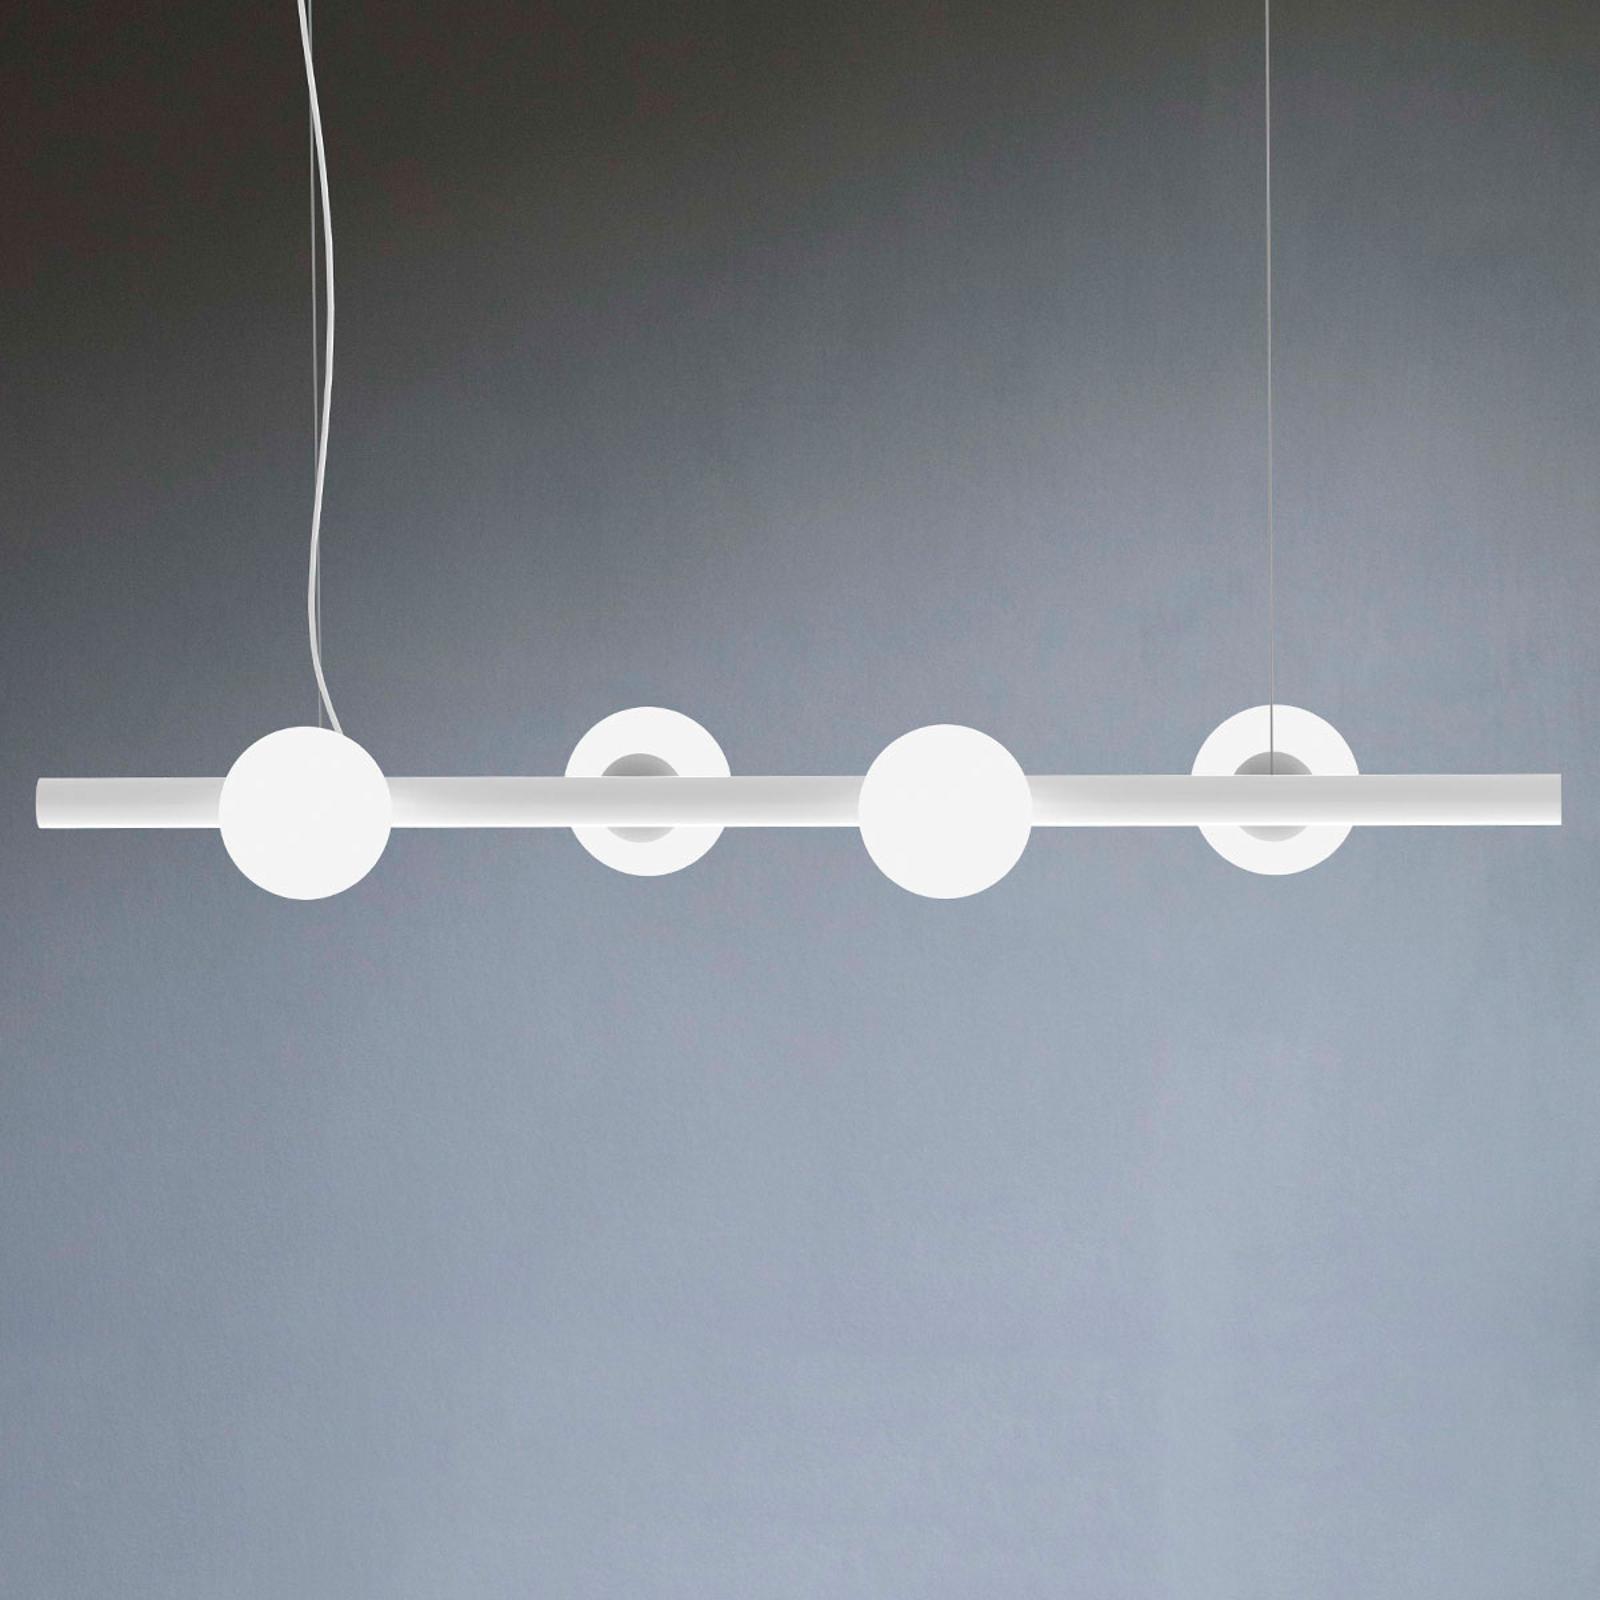 Lampa wisząca Tin Tin 4-punktowa biała